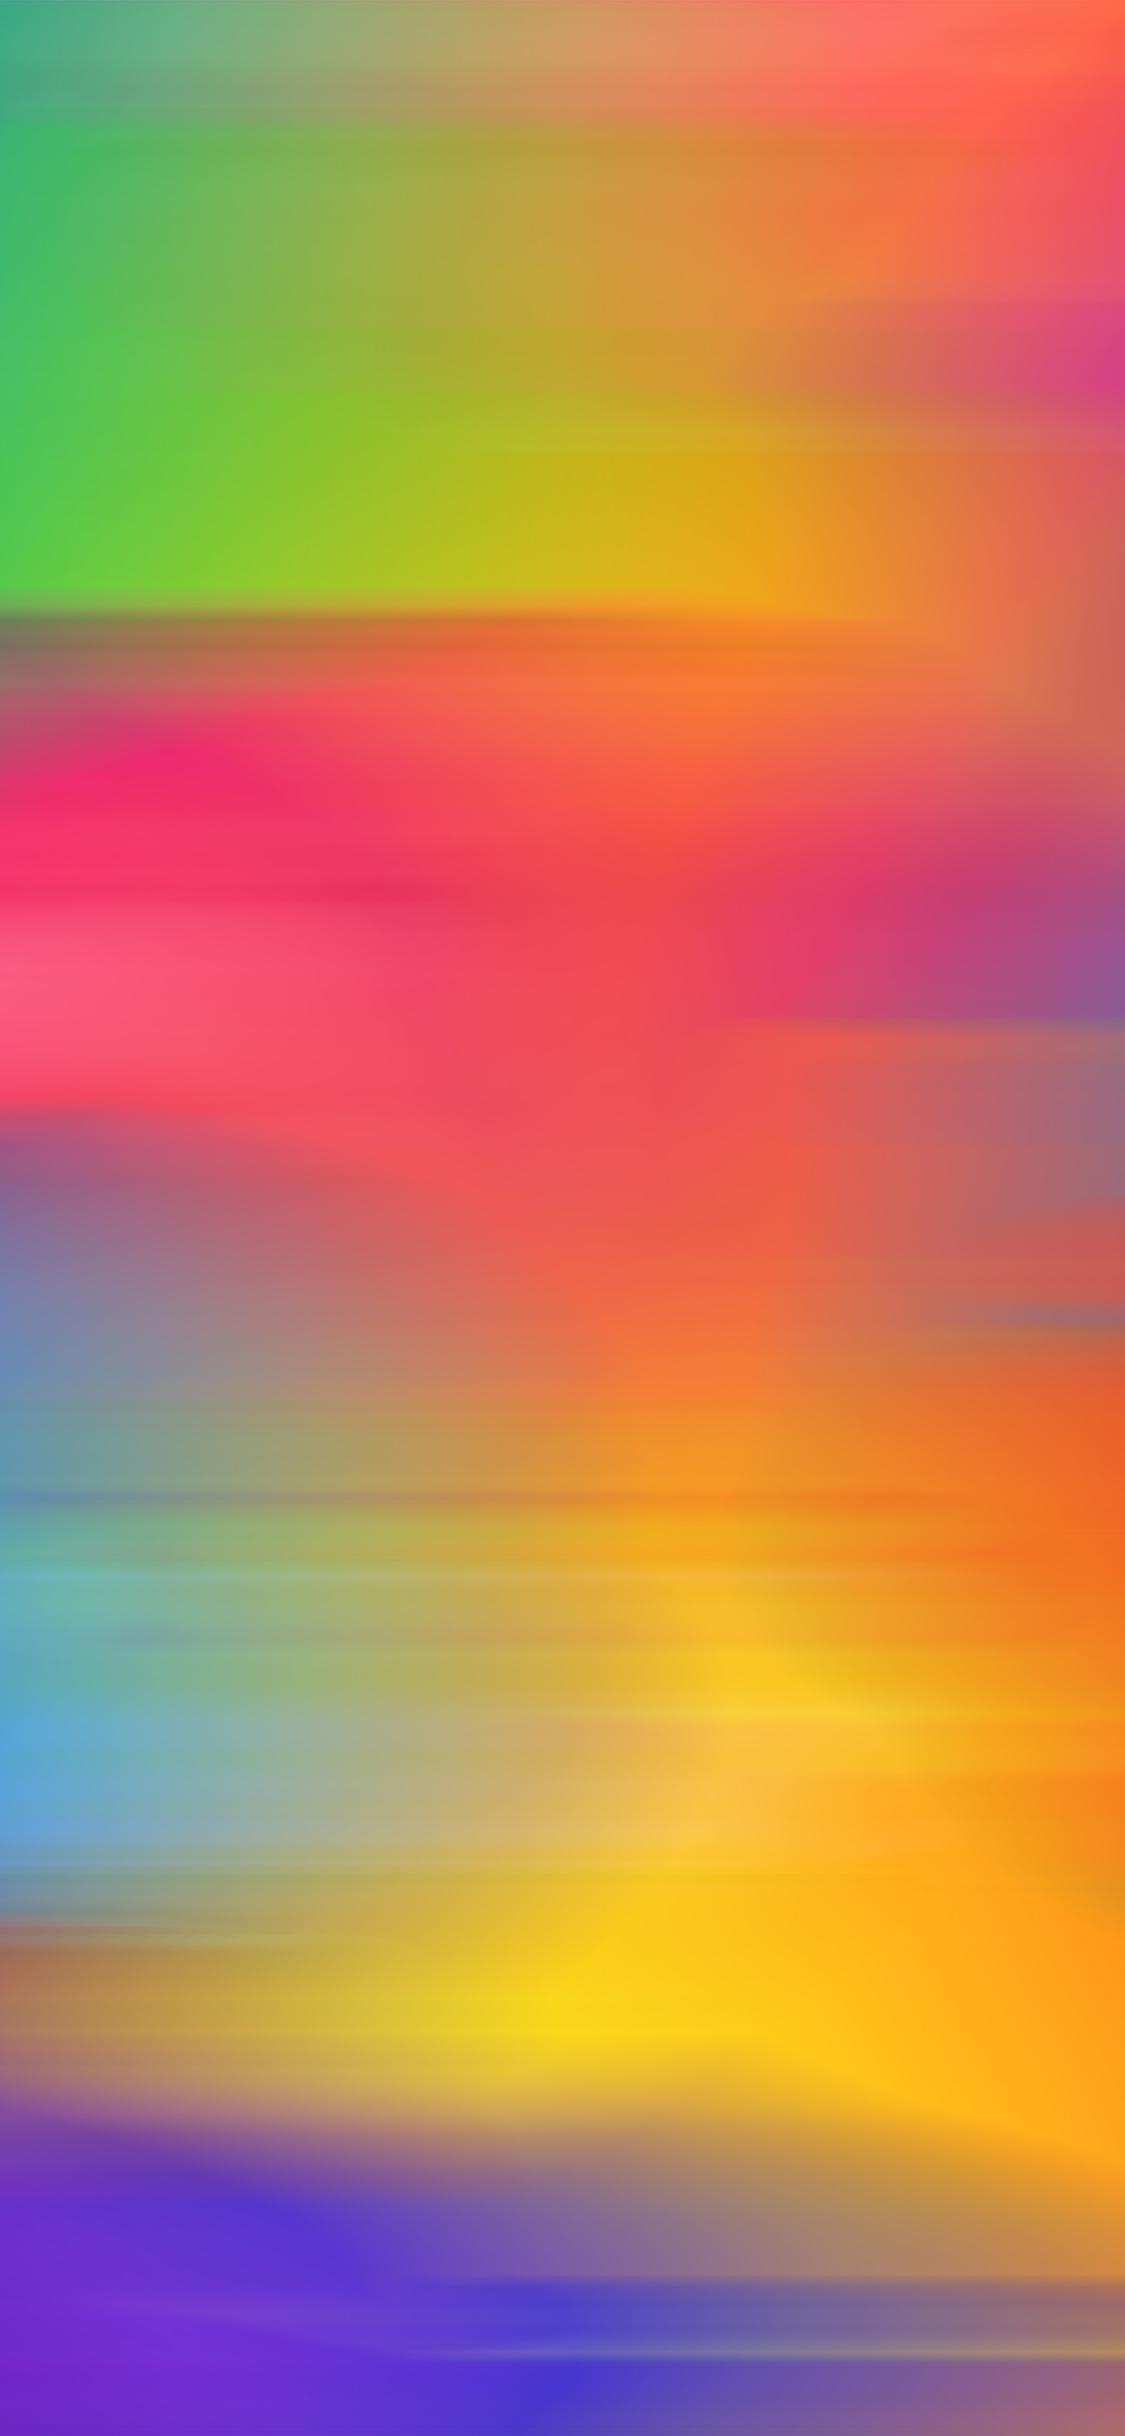 iPhoneXpapers.com-Apple-iPhone-wallpaper-vn05-rainbow-color-paint-art-ink-default-pattern-motion